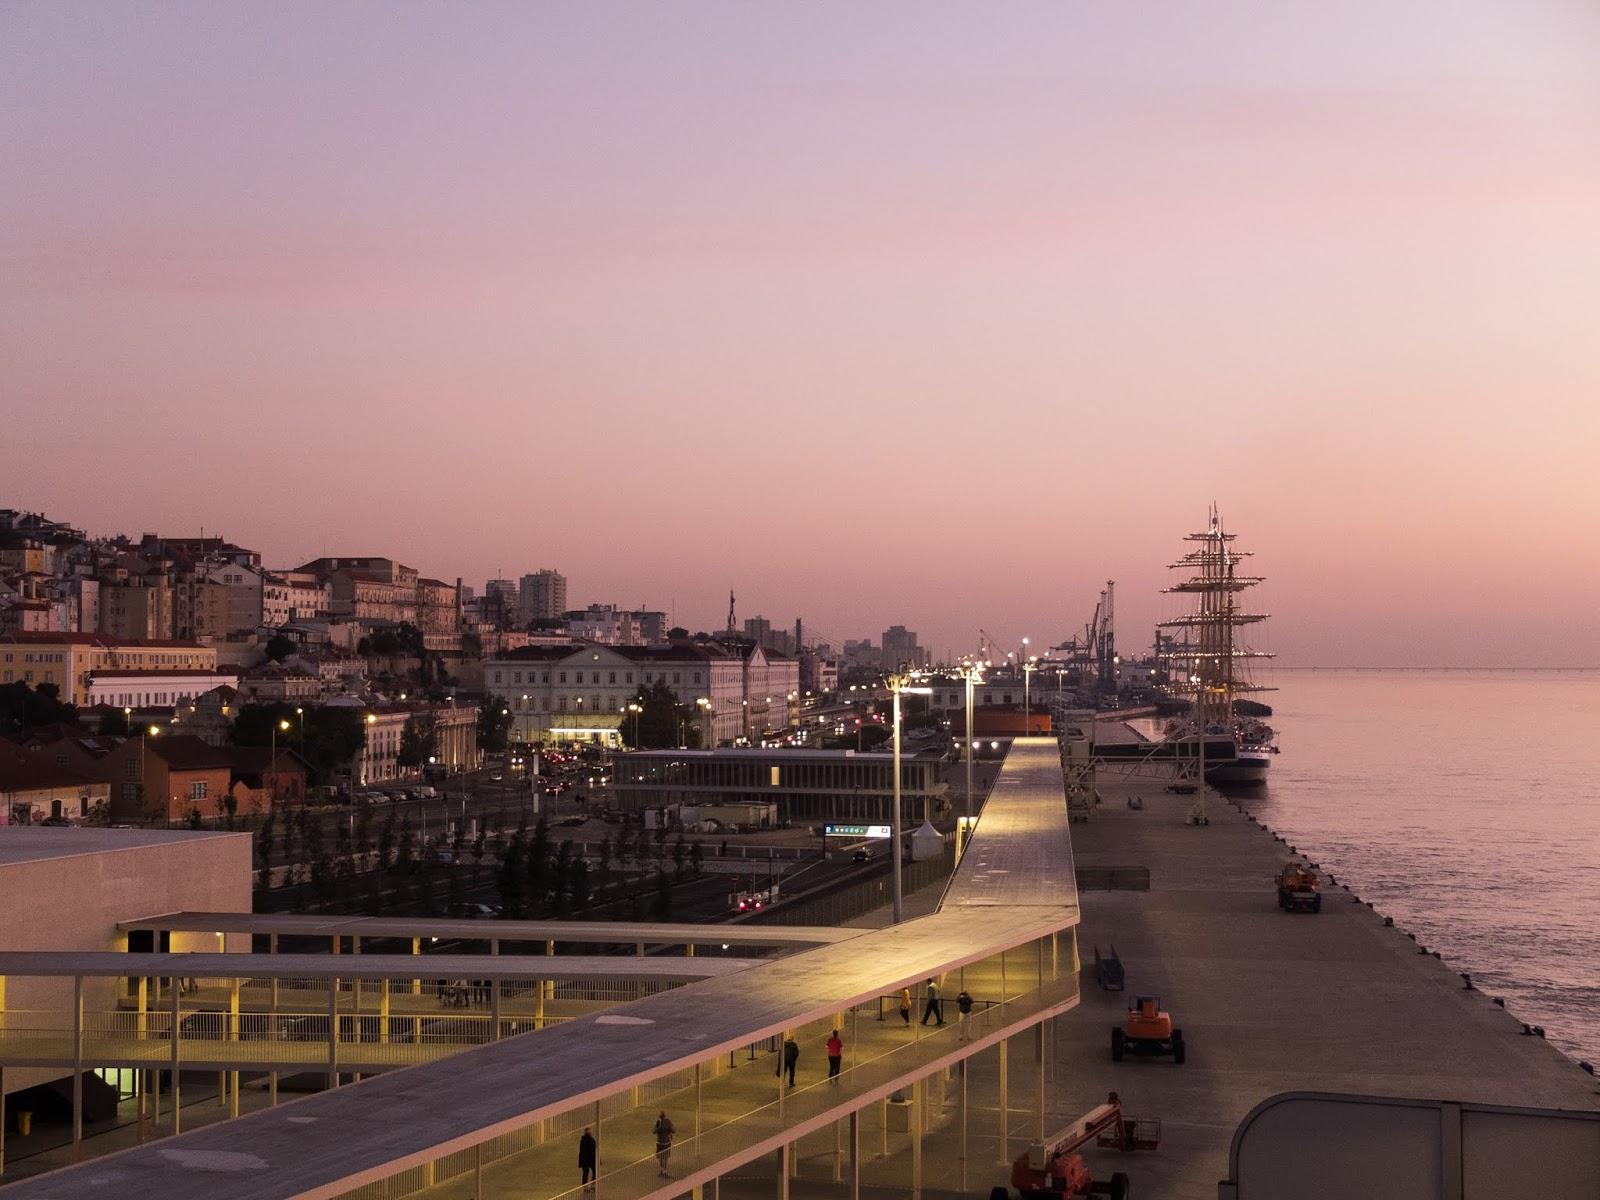 The port of Lisbon captured at sunrise in October 2018.